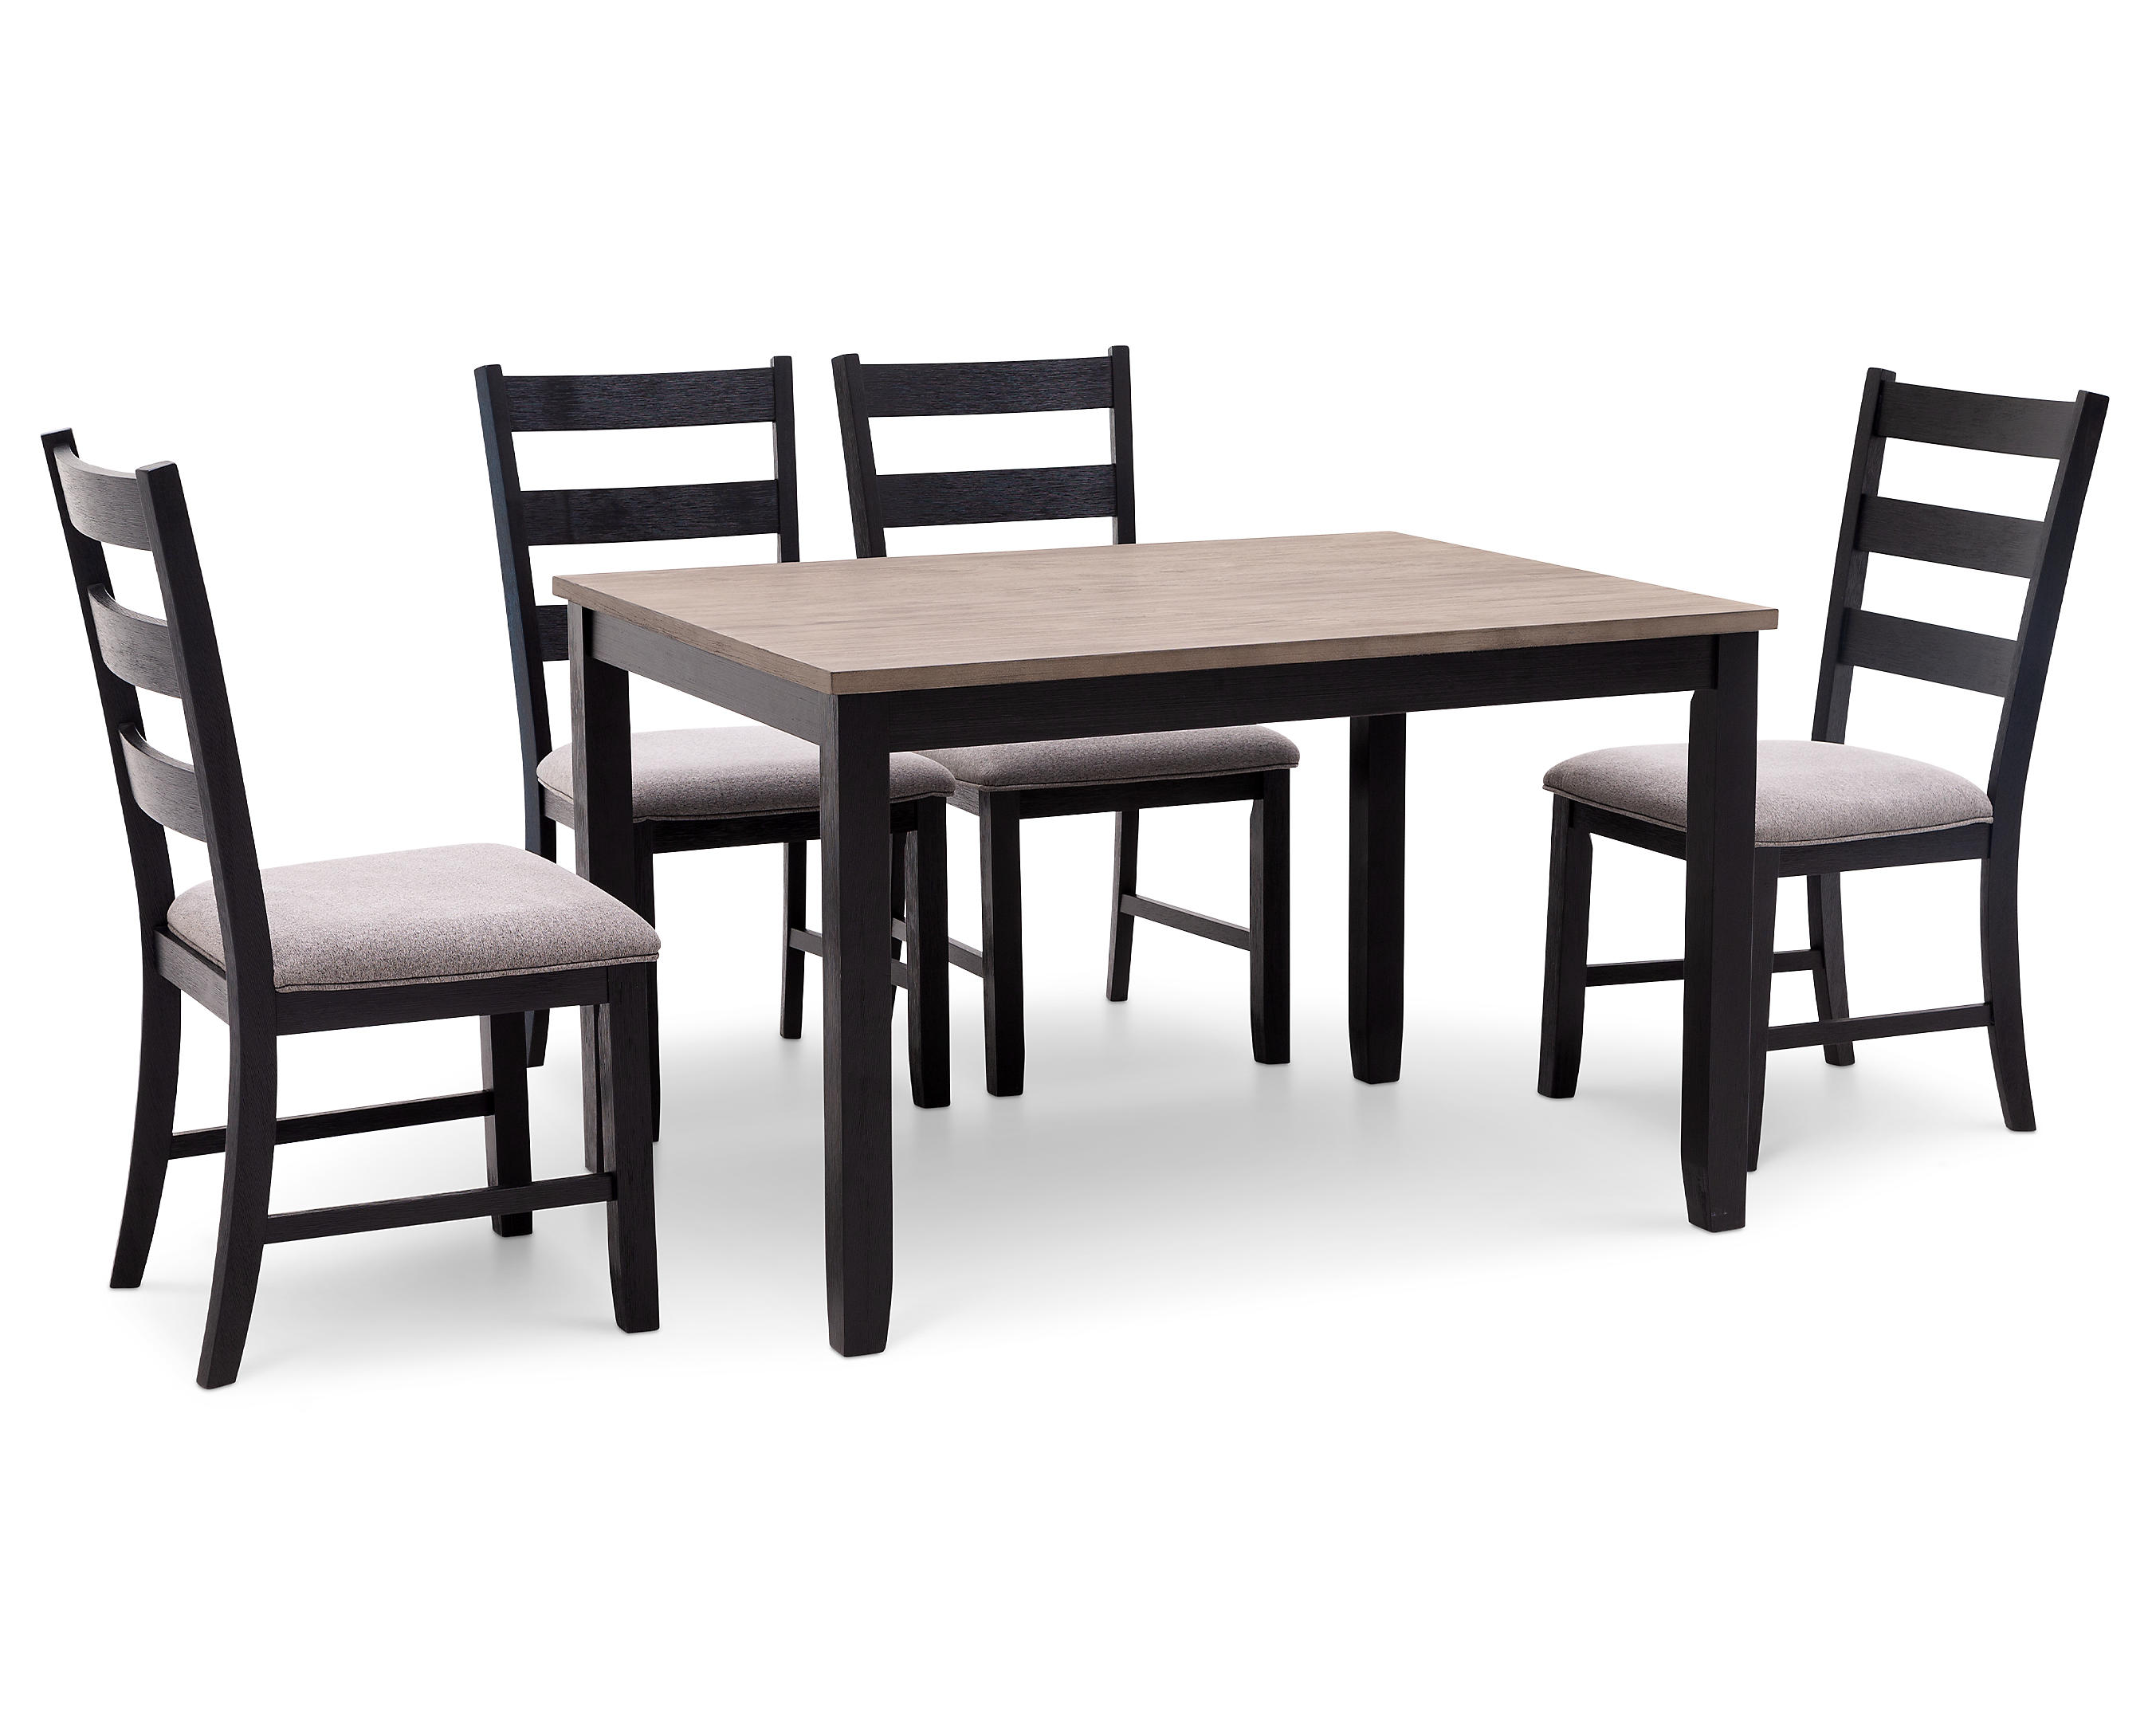 Martin 5 Pc Dining Room Set Furniture Row